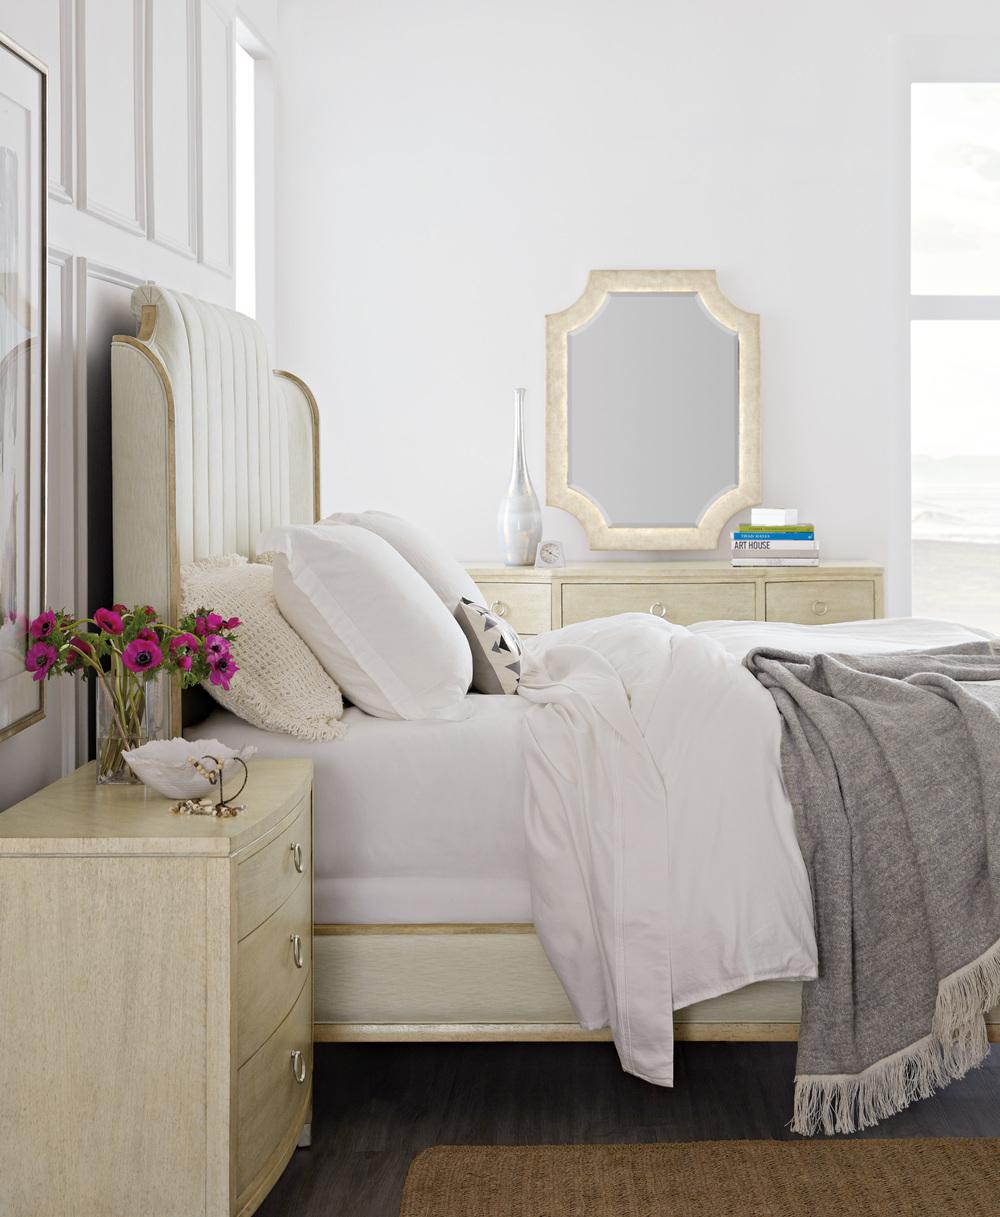 Hooker Furniture - Mirada Cal King Upholstered Bed